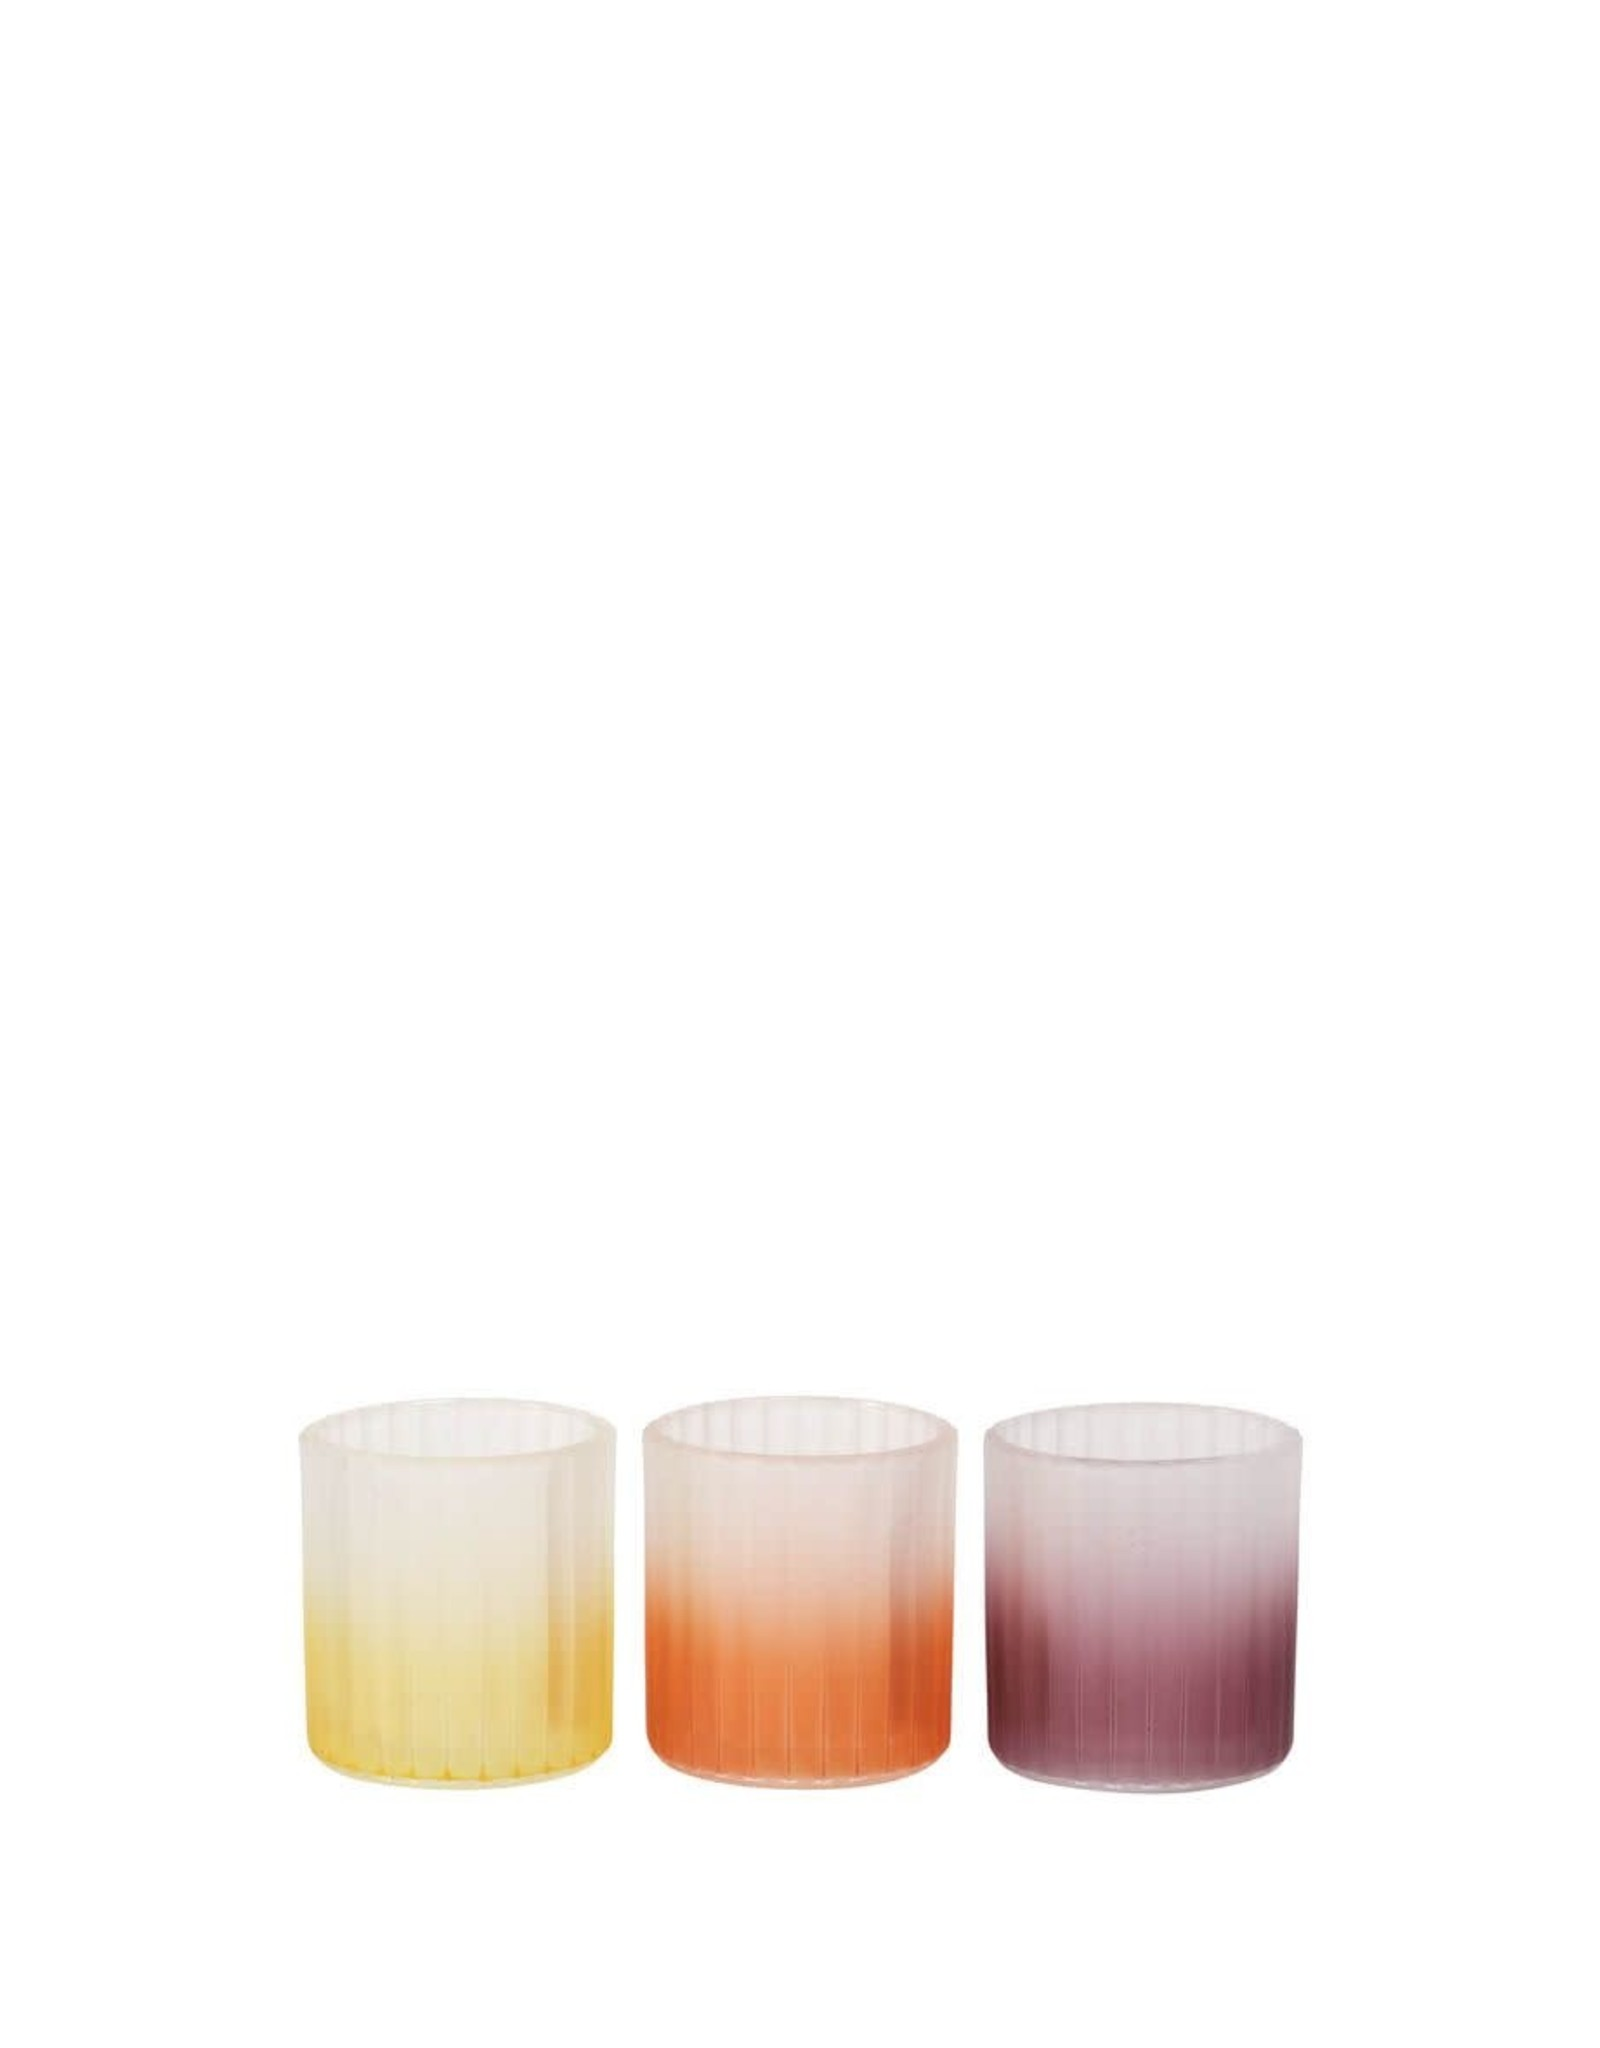 Waxinehouder D7.5XH10cm Mix Geel/Lila/Oranje Set/3